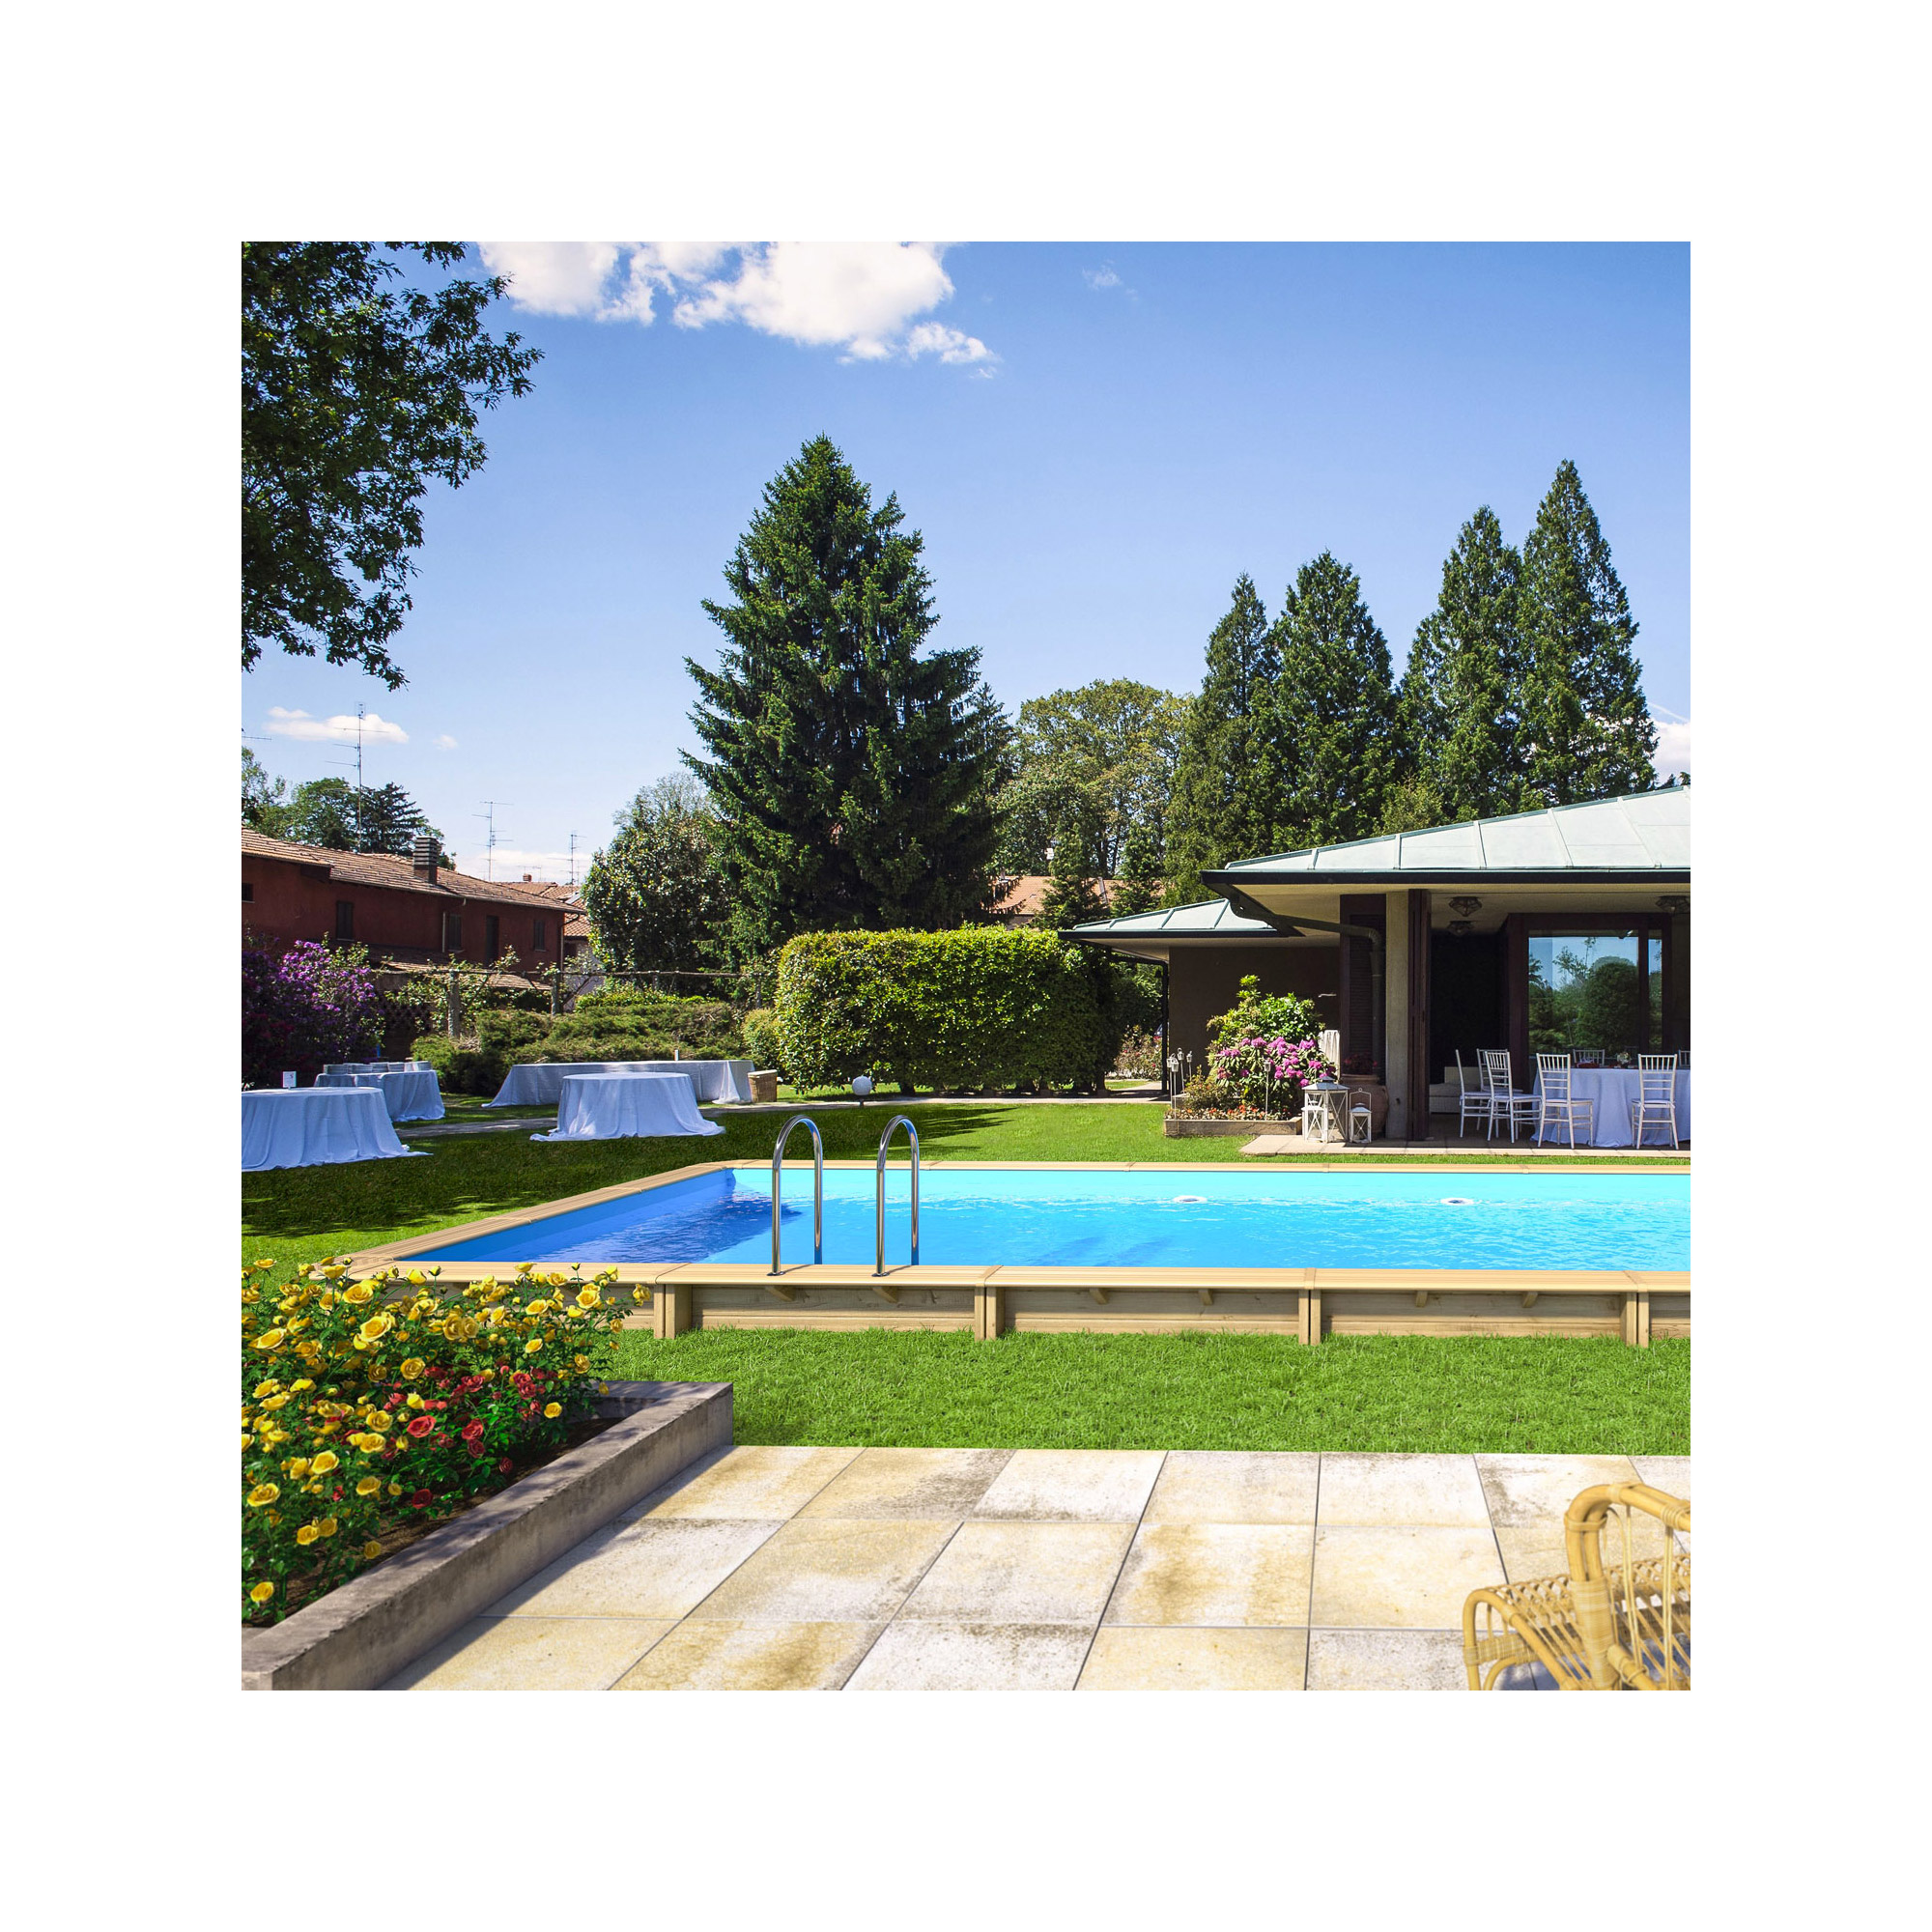 piscine bois rectangulaire hors sol semi enterr e. Black Bedroom Furniture Sets. Home Design Ideas